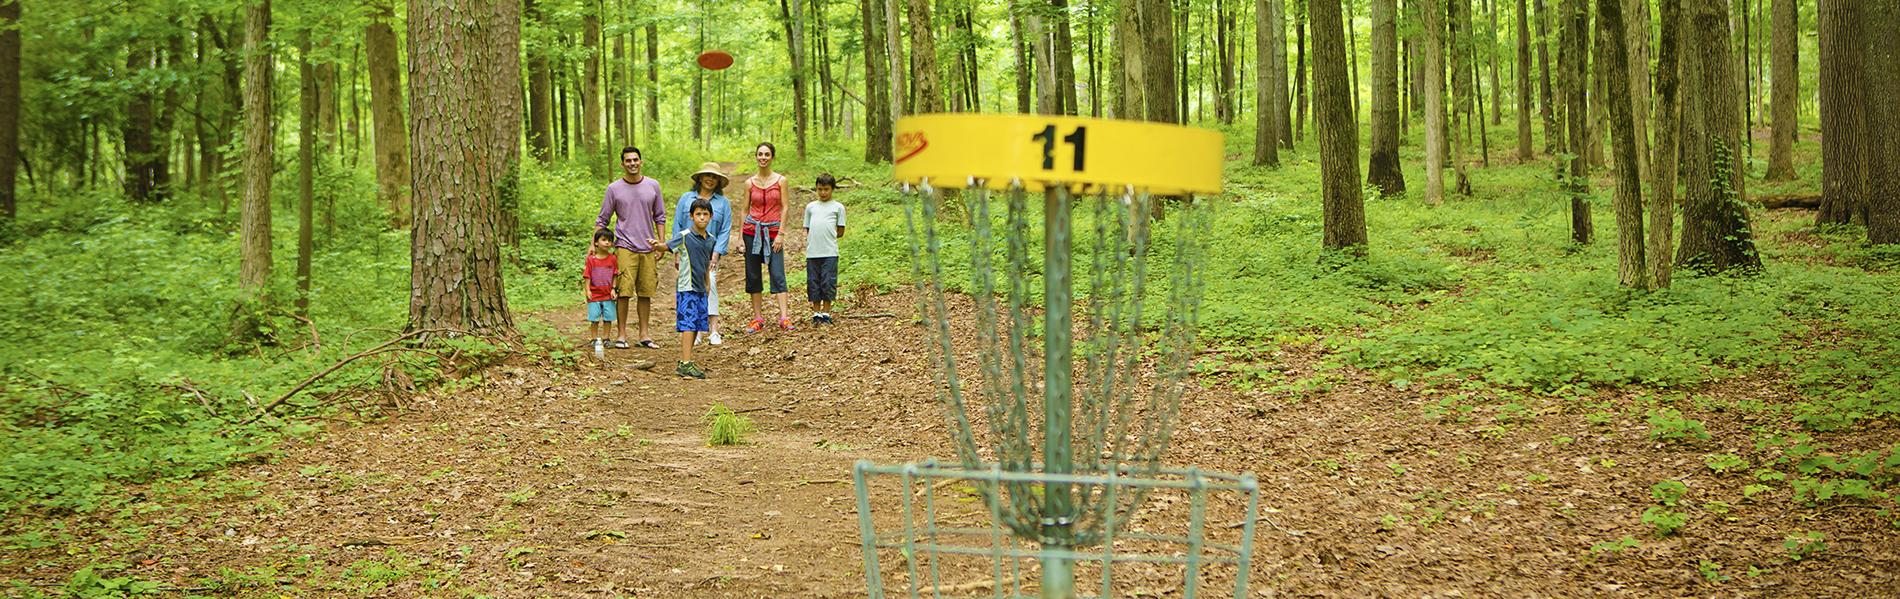 Disc Golfing at Fort Yargo